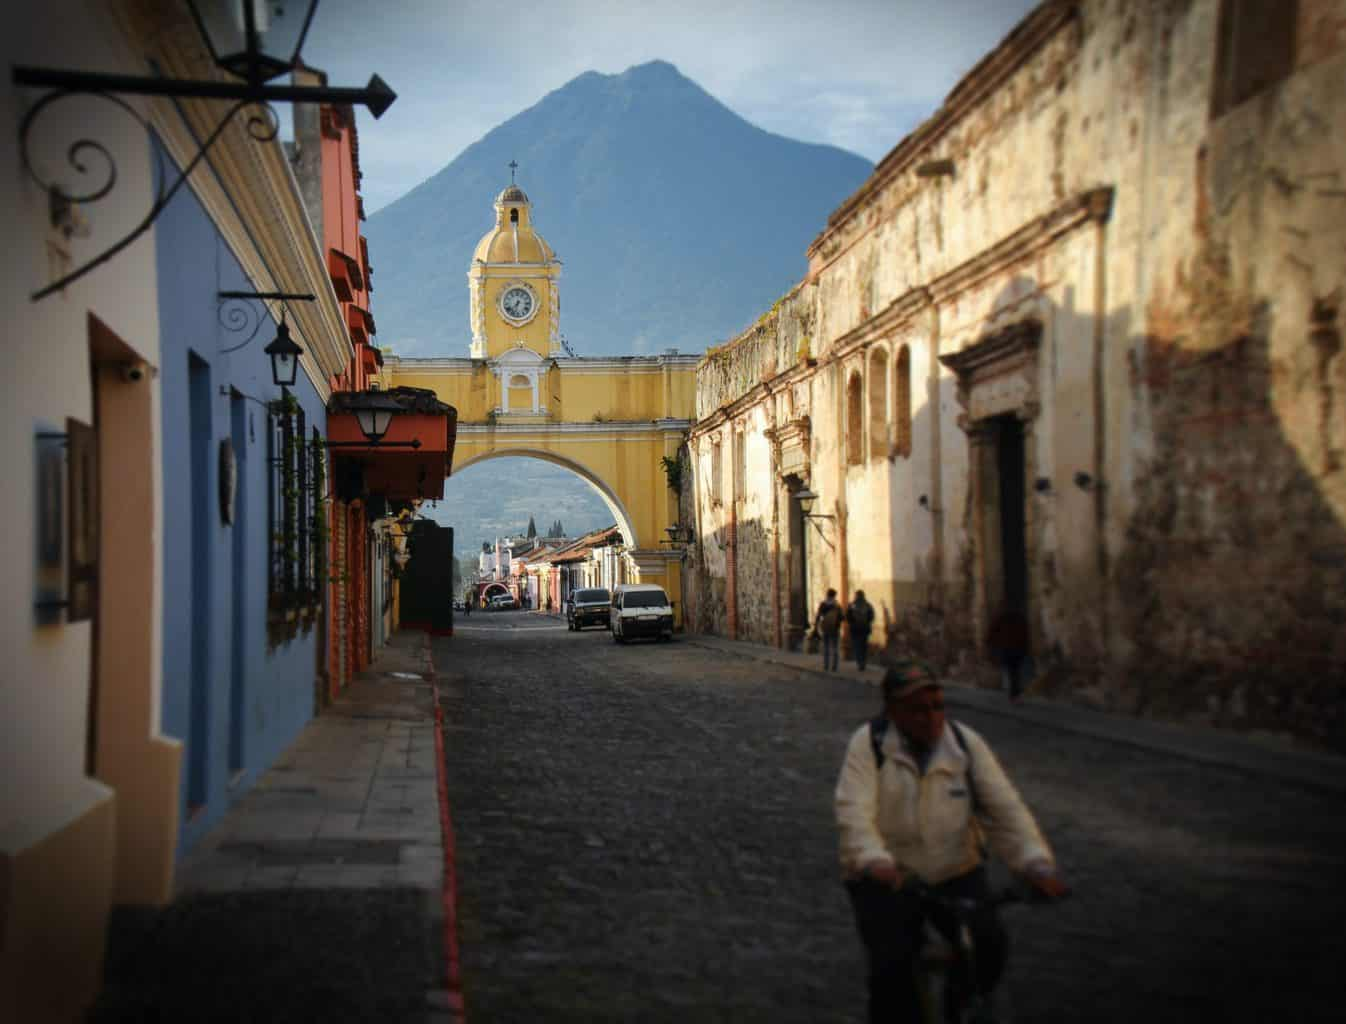 Guatemala guide for digital nomads